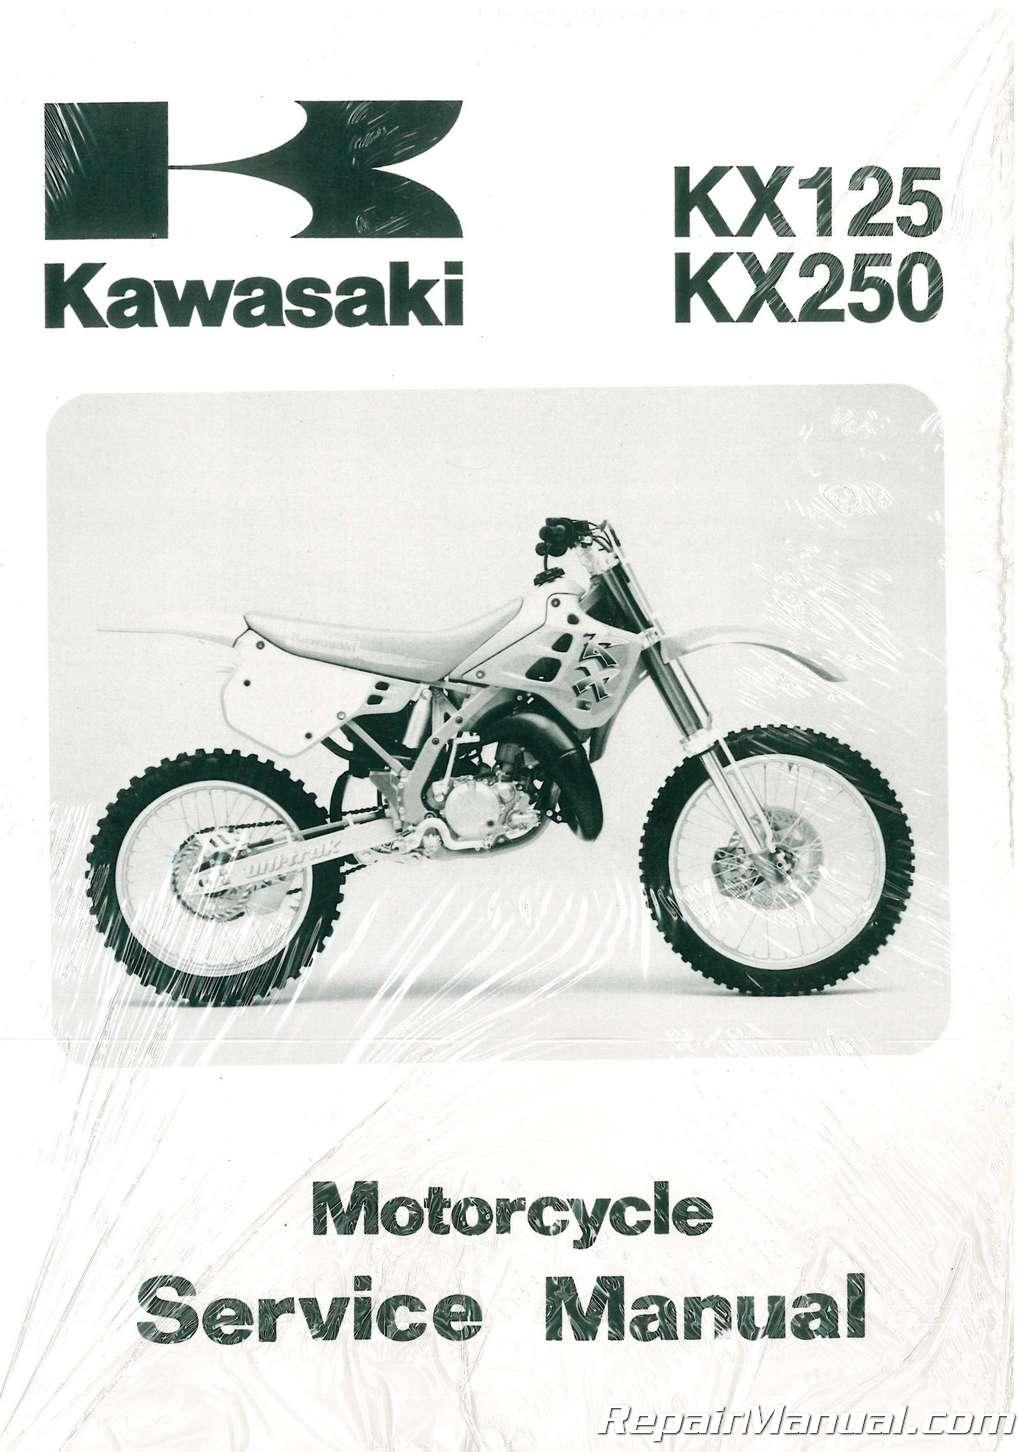 1990  u2013 1991 kawasaki kx125h1 kx250h1 service manual kx 125 wiring diagram kx 125 wiring diagram kx 125 wiring diagram kx 125 wiring diagram